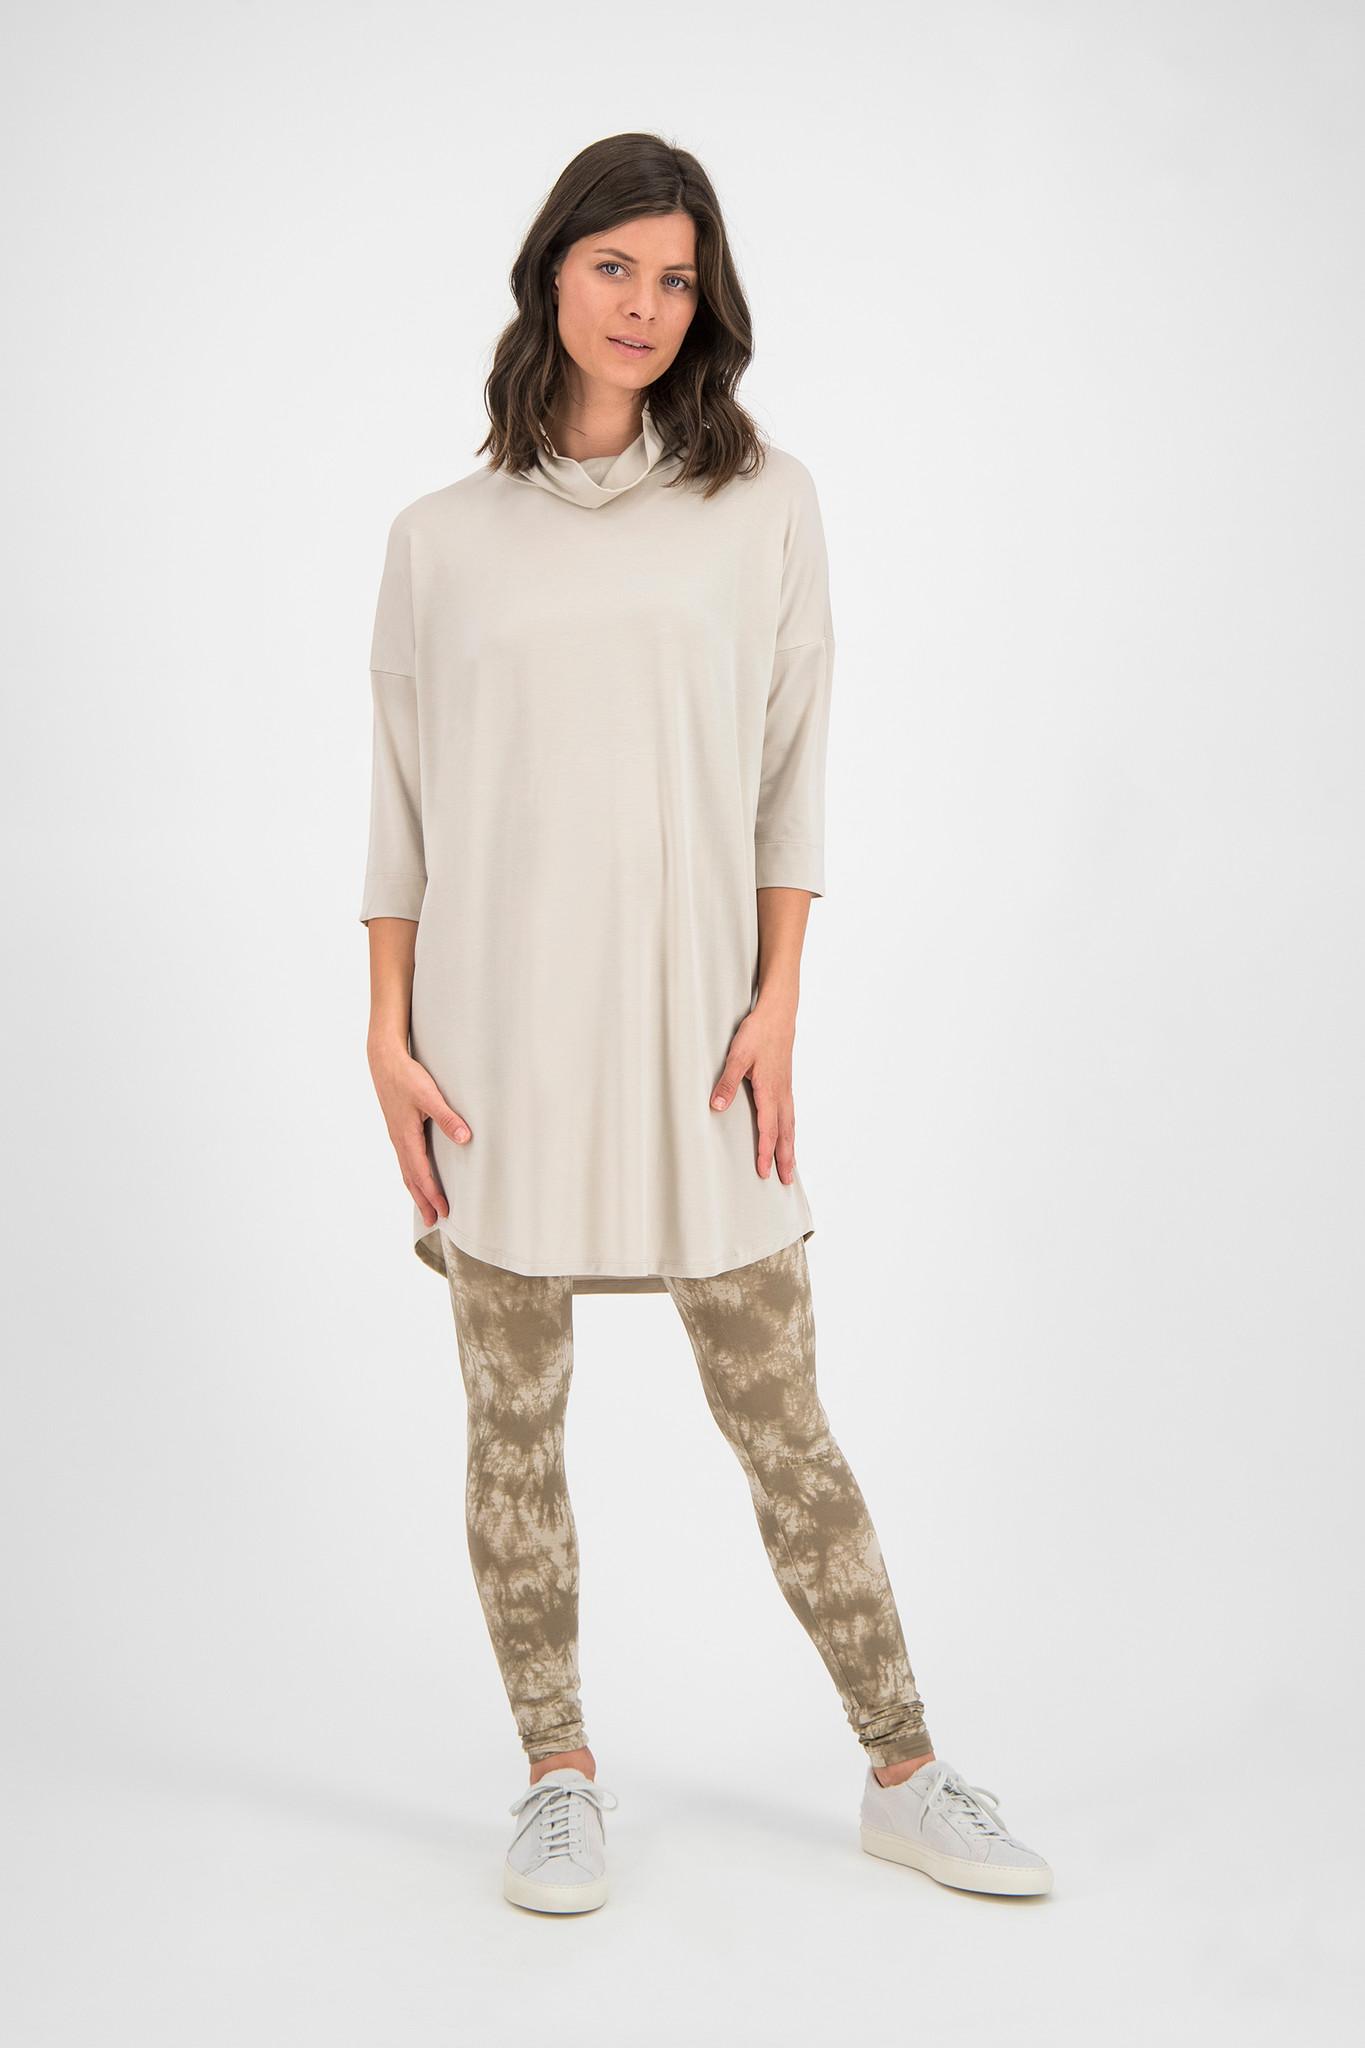 SYLVER New Lyocell Shirt - Oatmeal